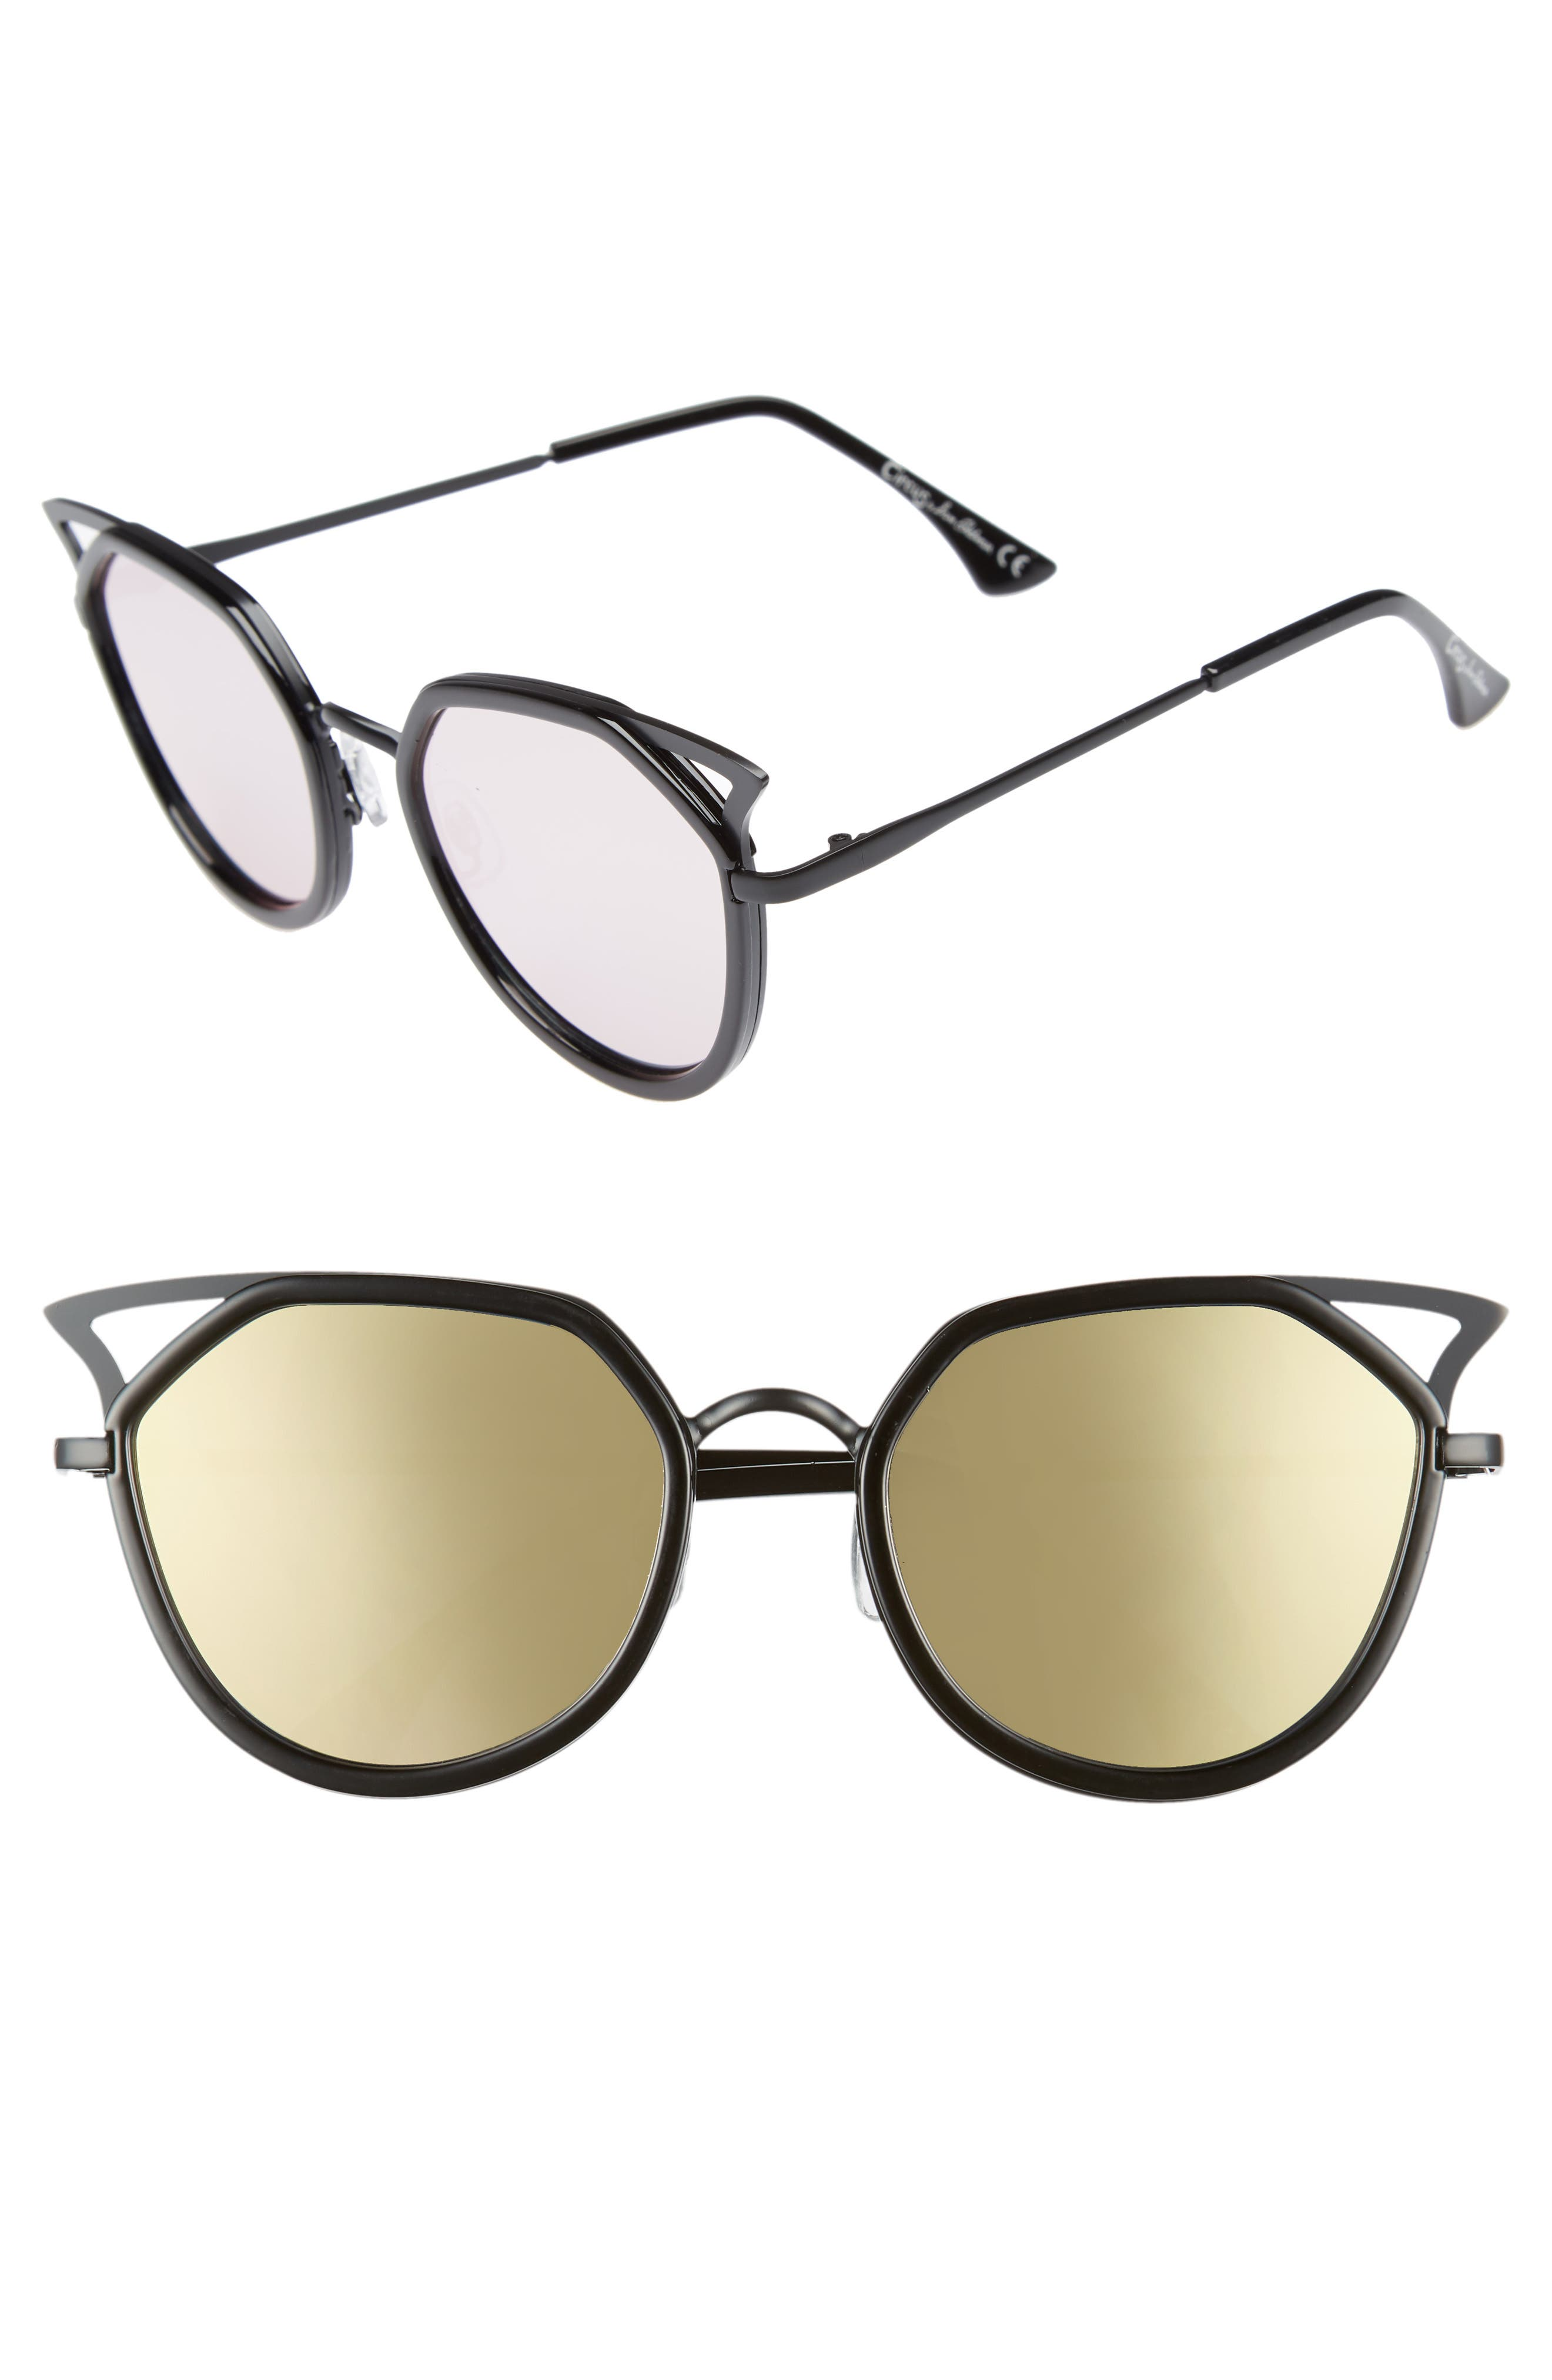 Satellite 60mm Cat Eye Sunglasses,                         Main,                         color, 001